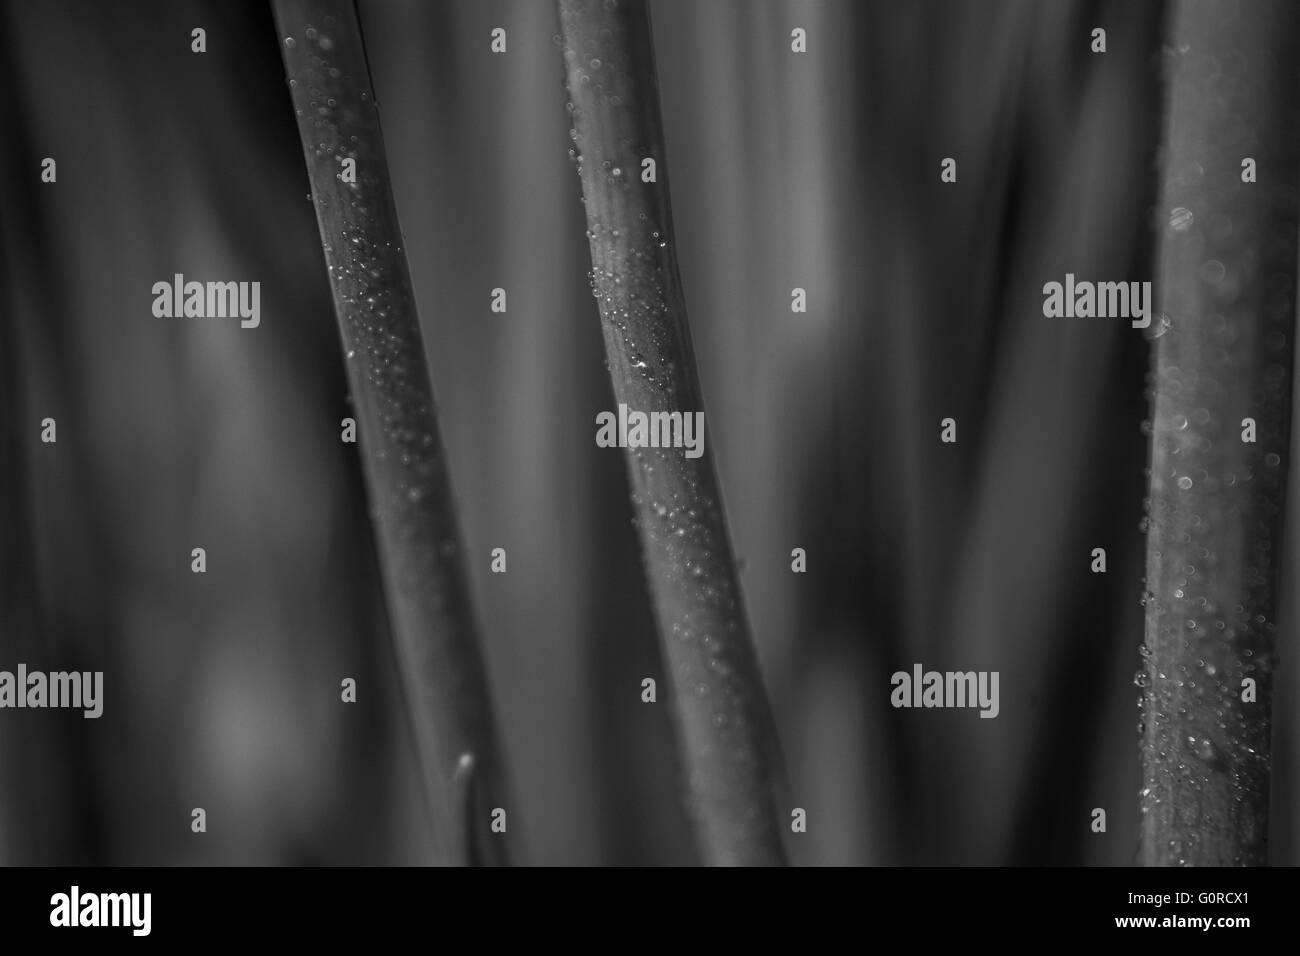 stems - Stock Image